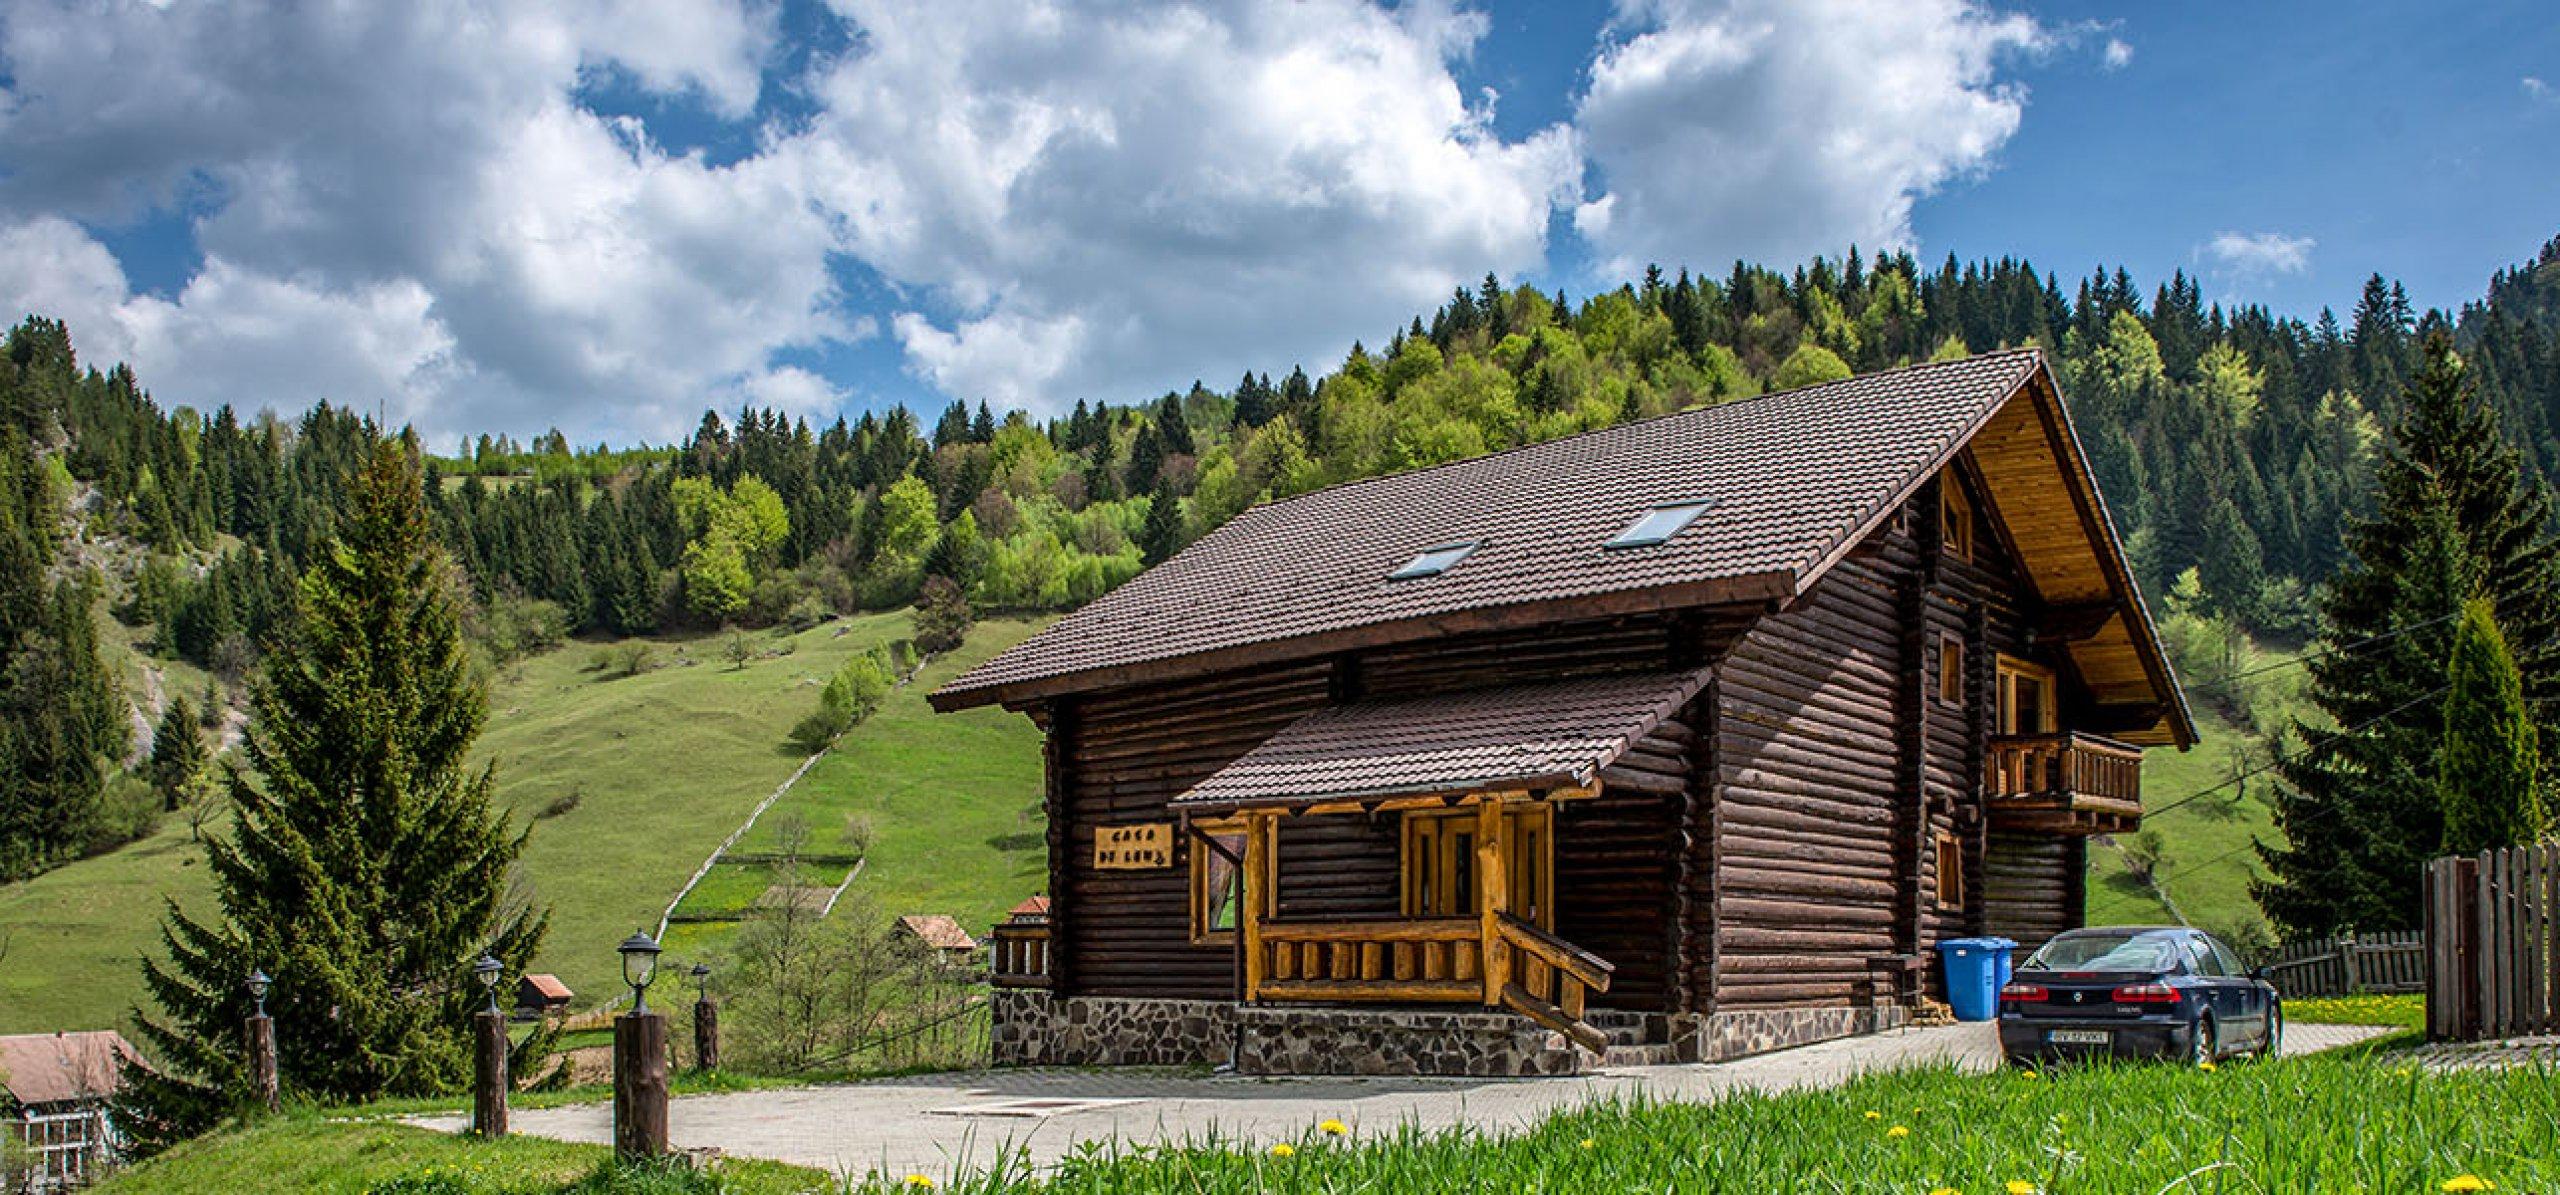 vila-de-lemn-peisaj-montan-cazare-in-moeciu-2